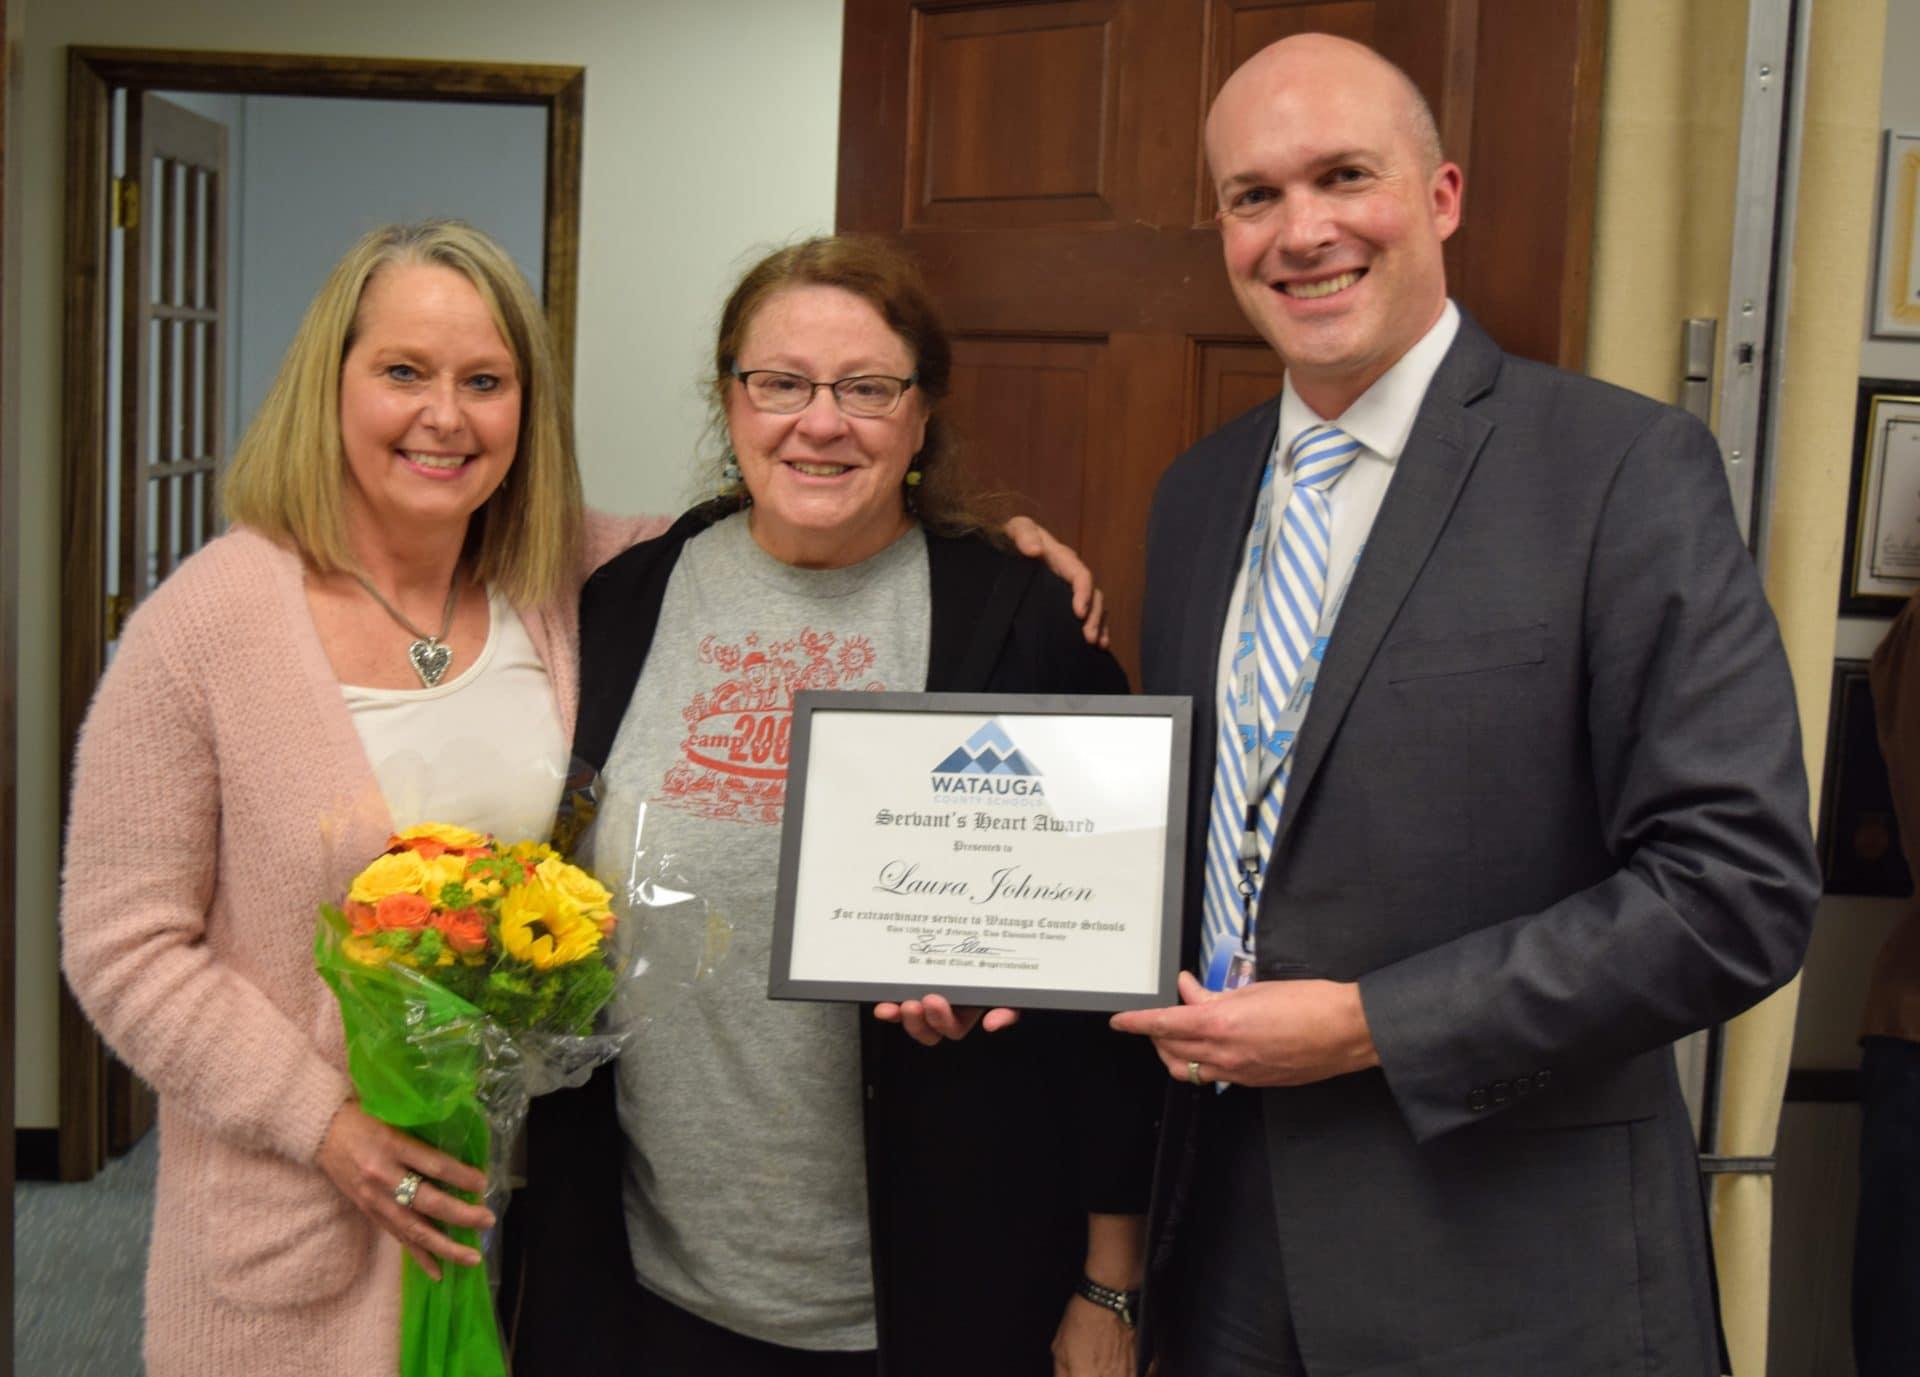 Laura Johnson presented with Servant's Heart Award